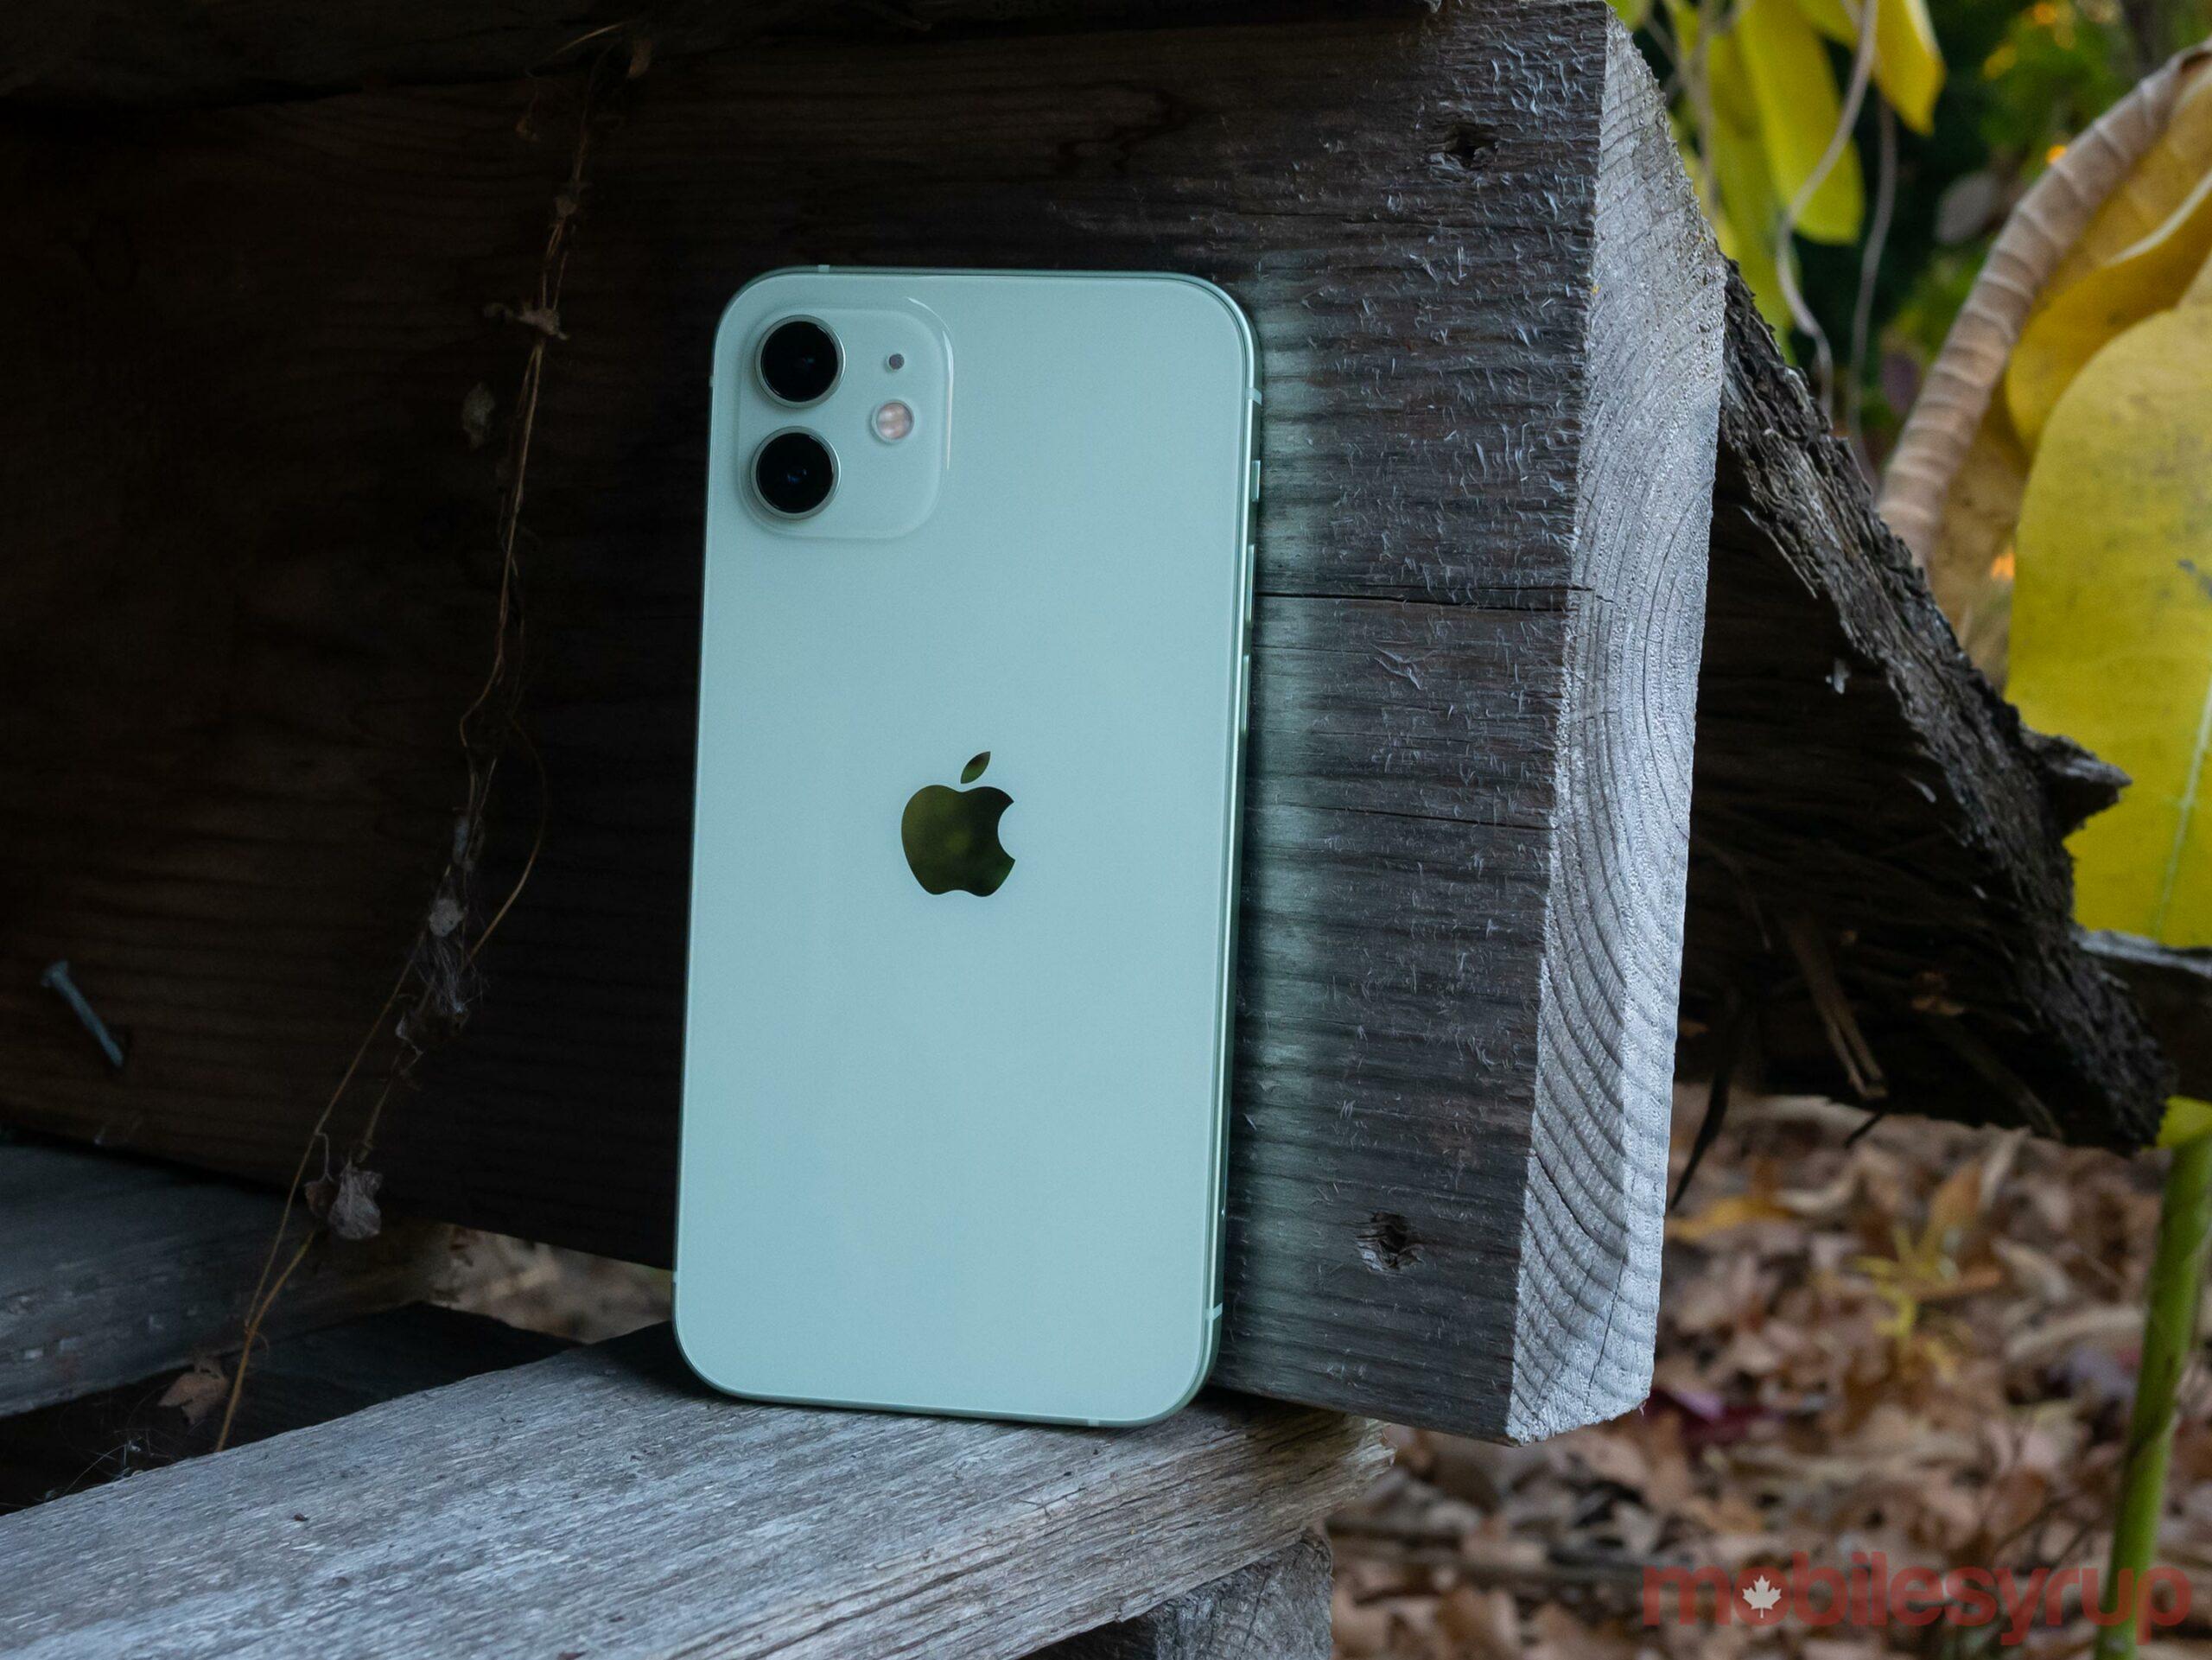 iPhone 12 back